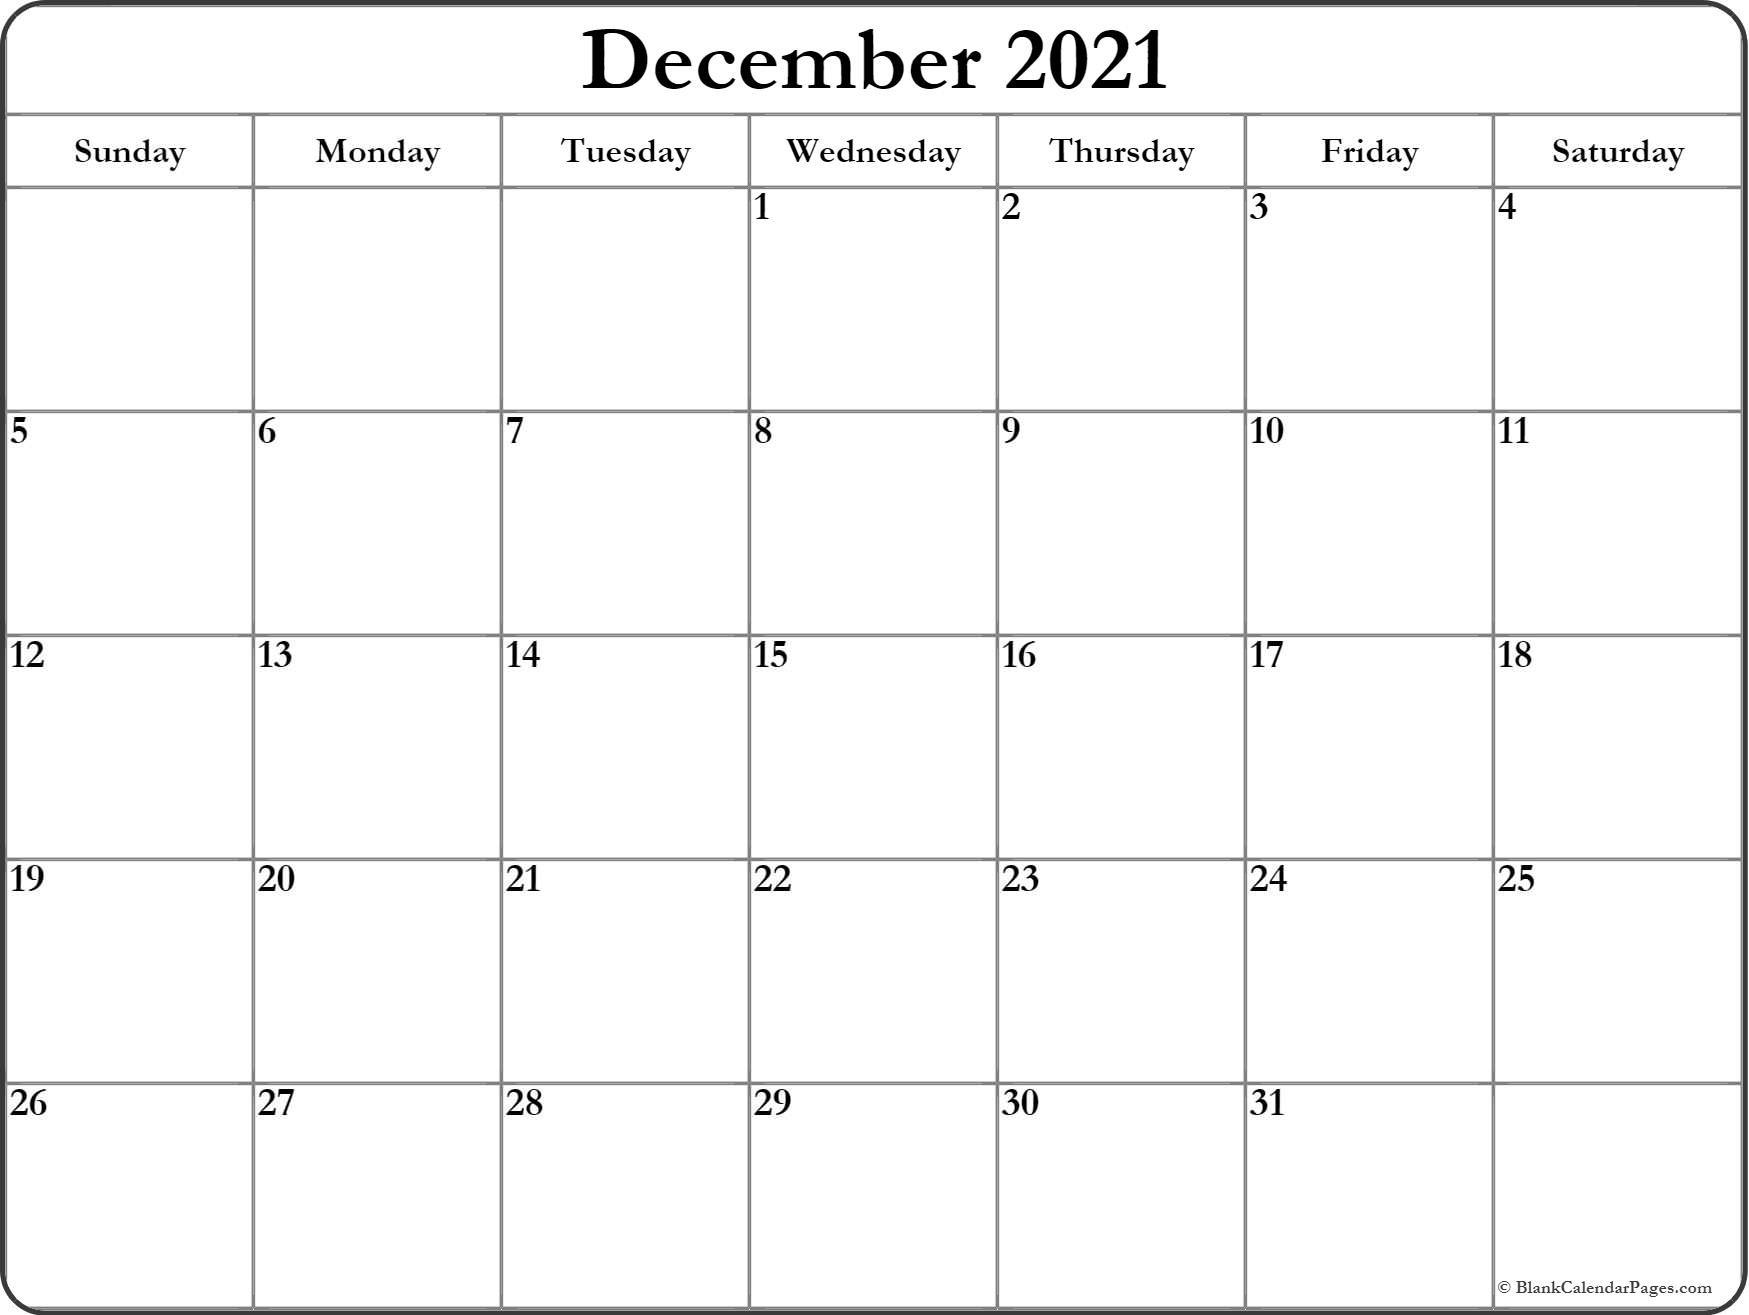 December 2021 Blank Calendar Templates.  Blank 2021 2021 Calendar Template